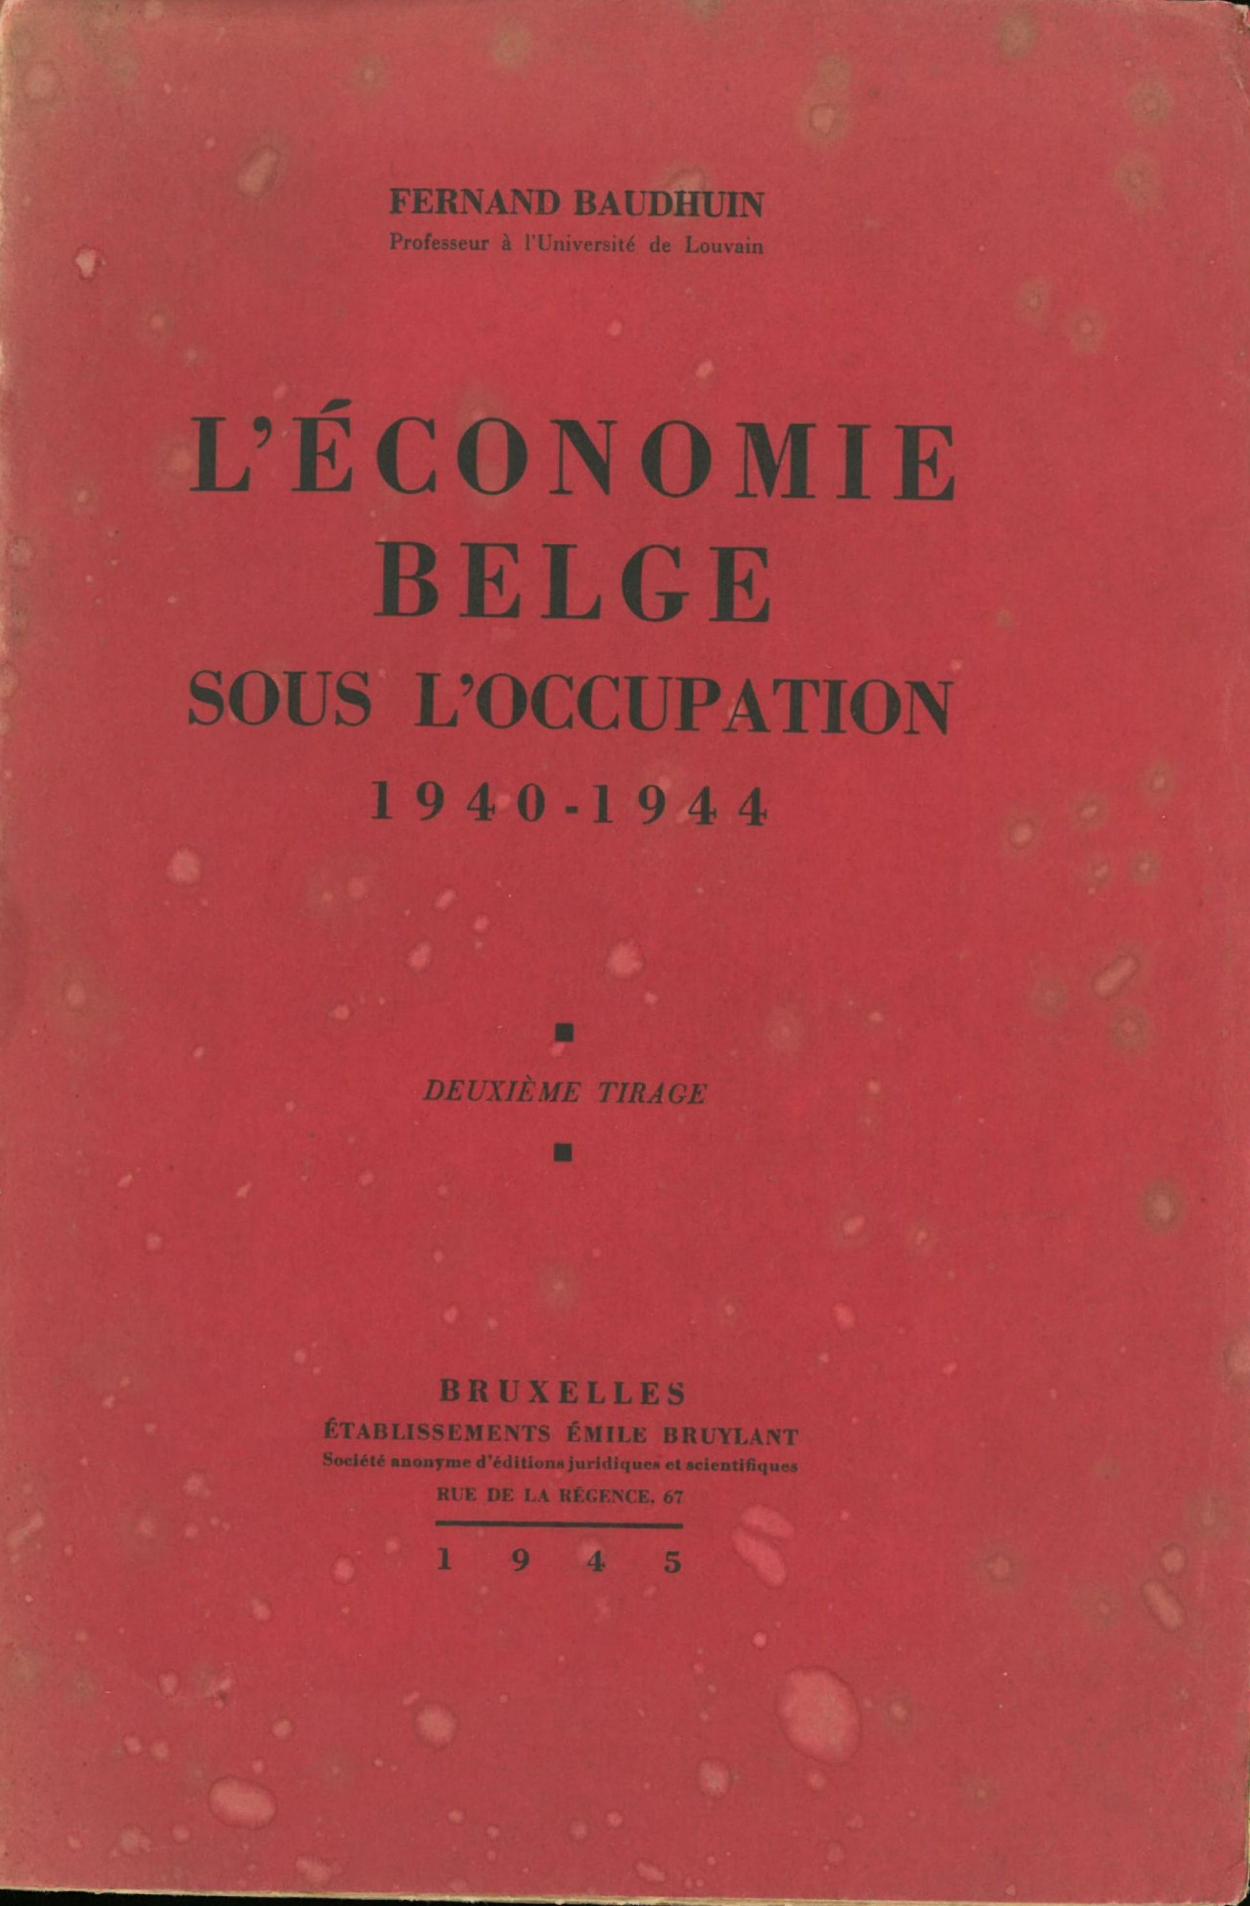 econo-belge-couv.jpg